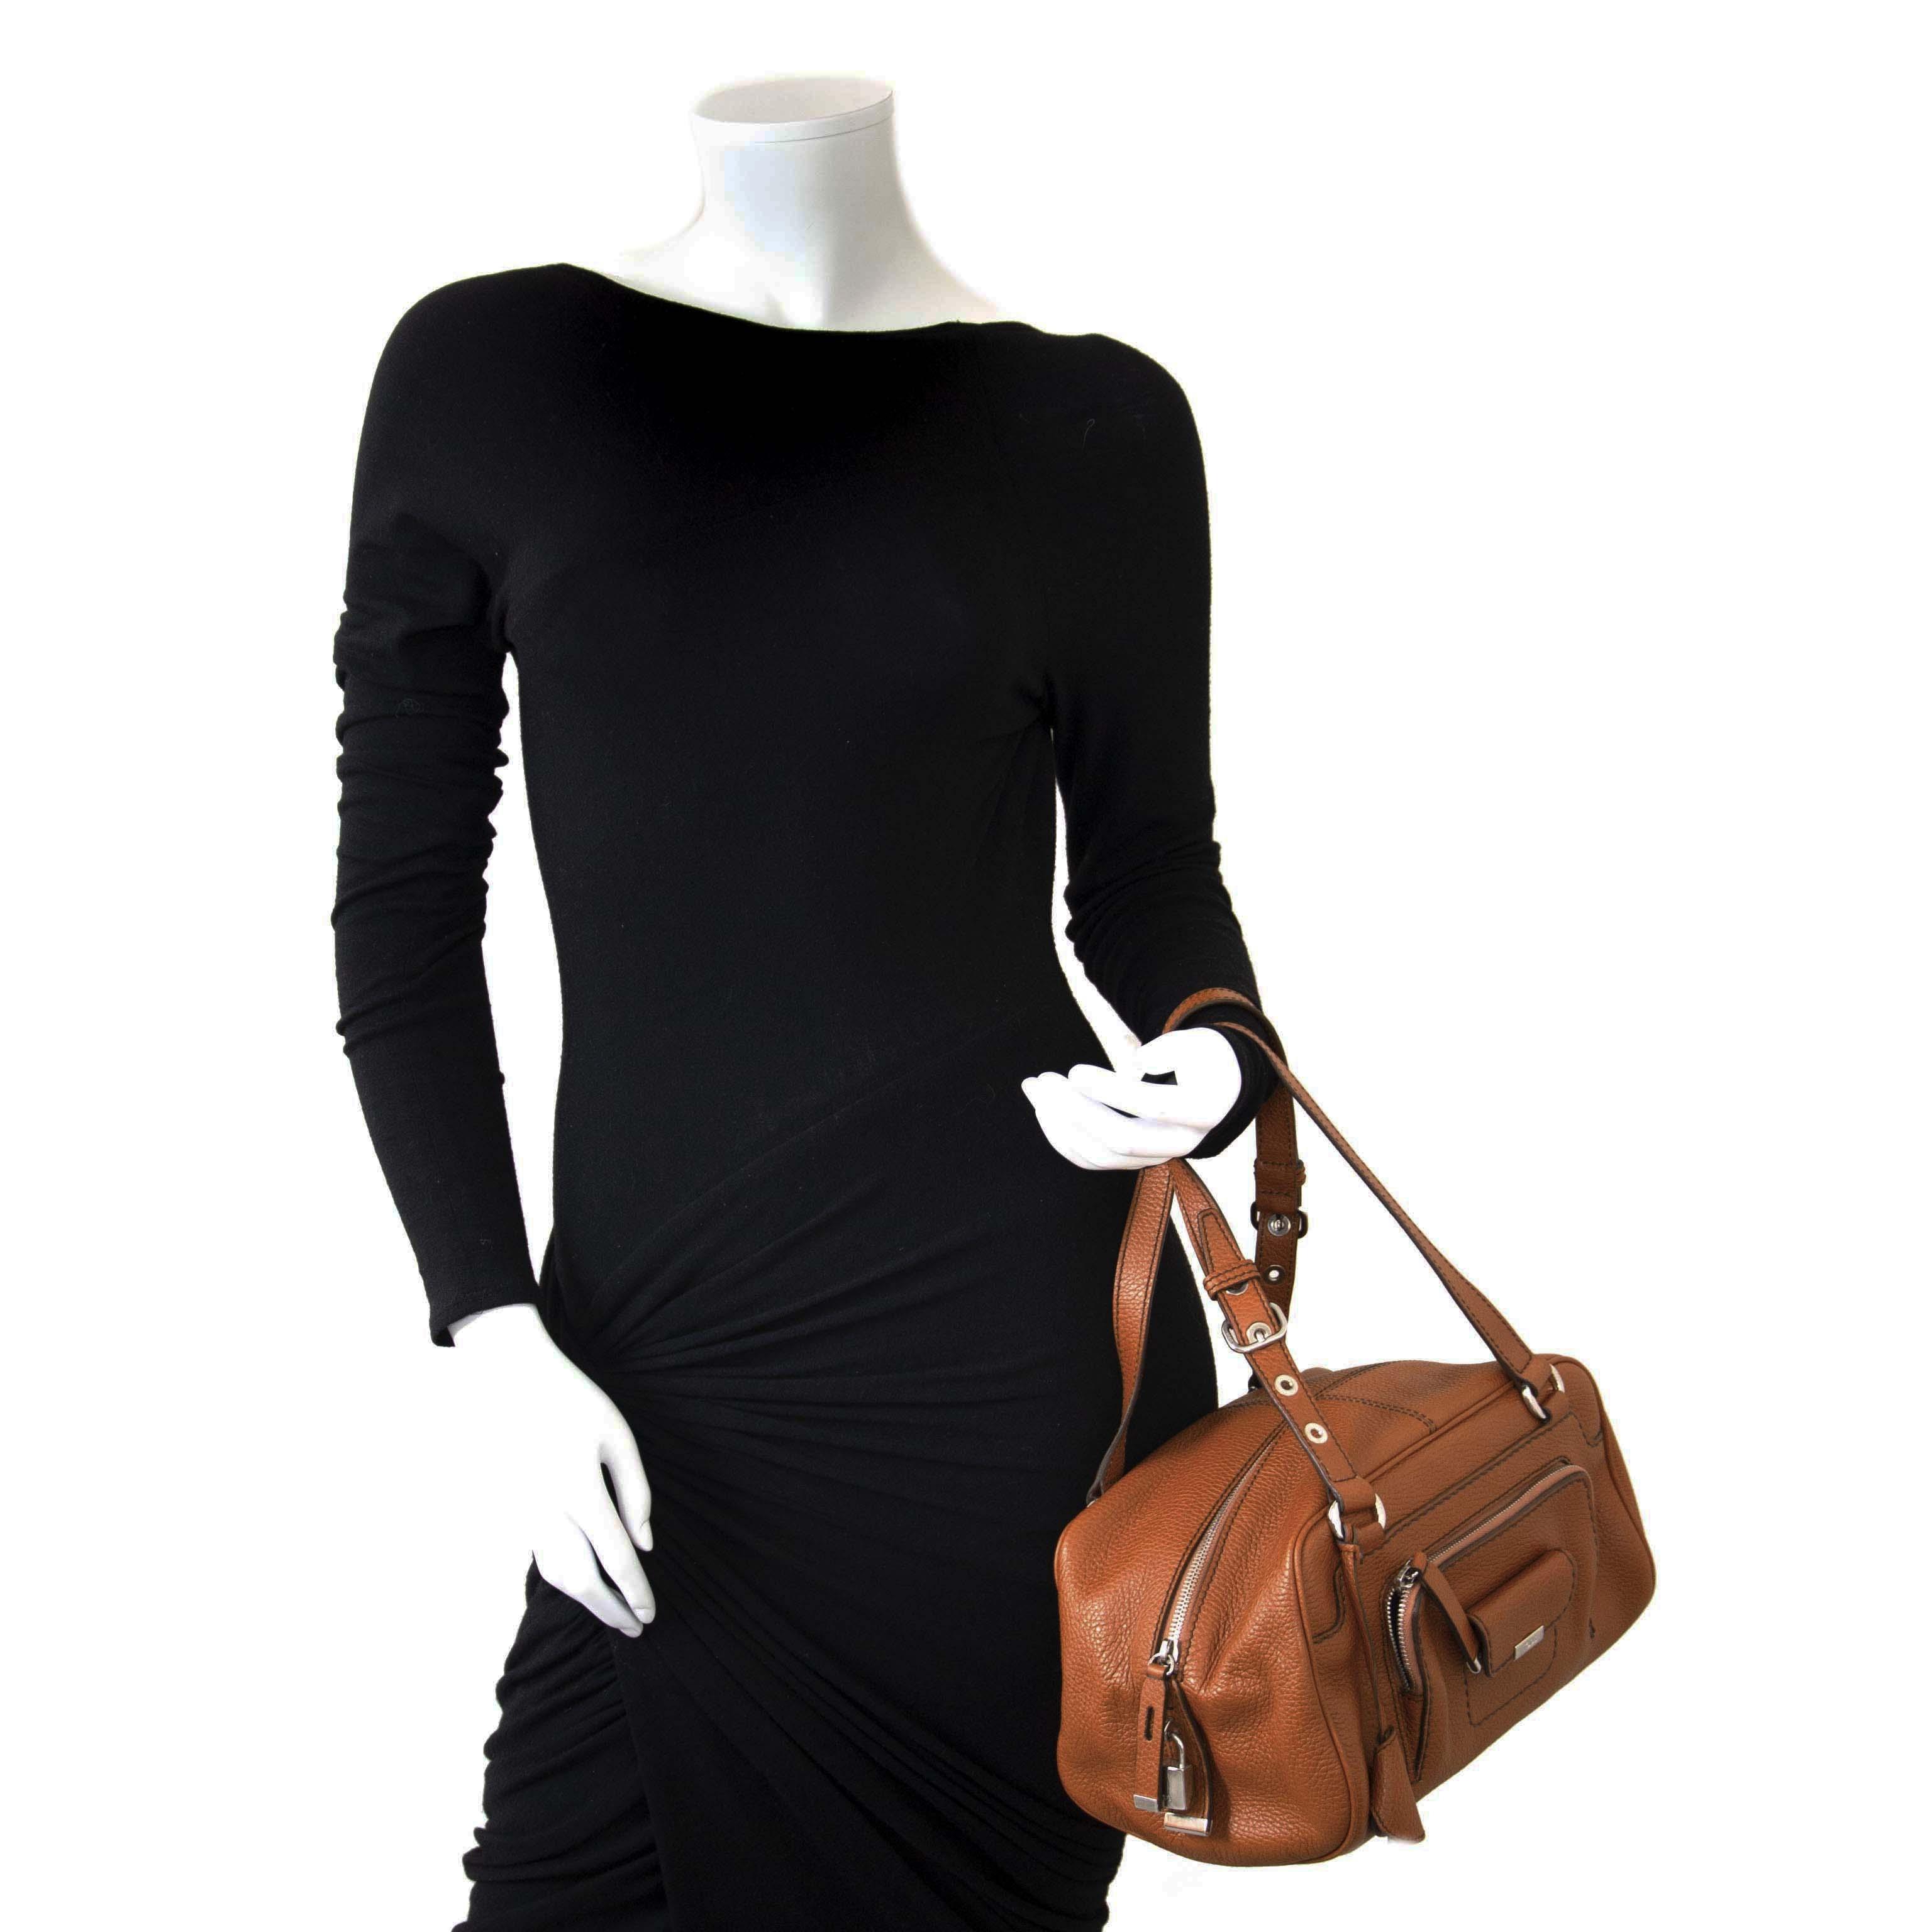 4560ffe108 ... Tod's Cognac Leather Shoulder Bag now for sale at labellov vintage  fashion webshop belgium